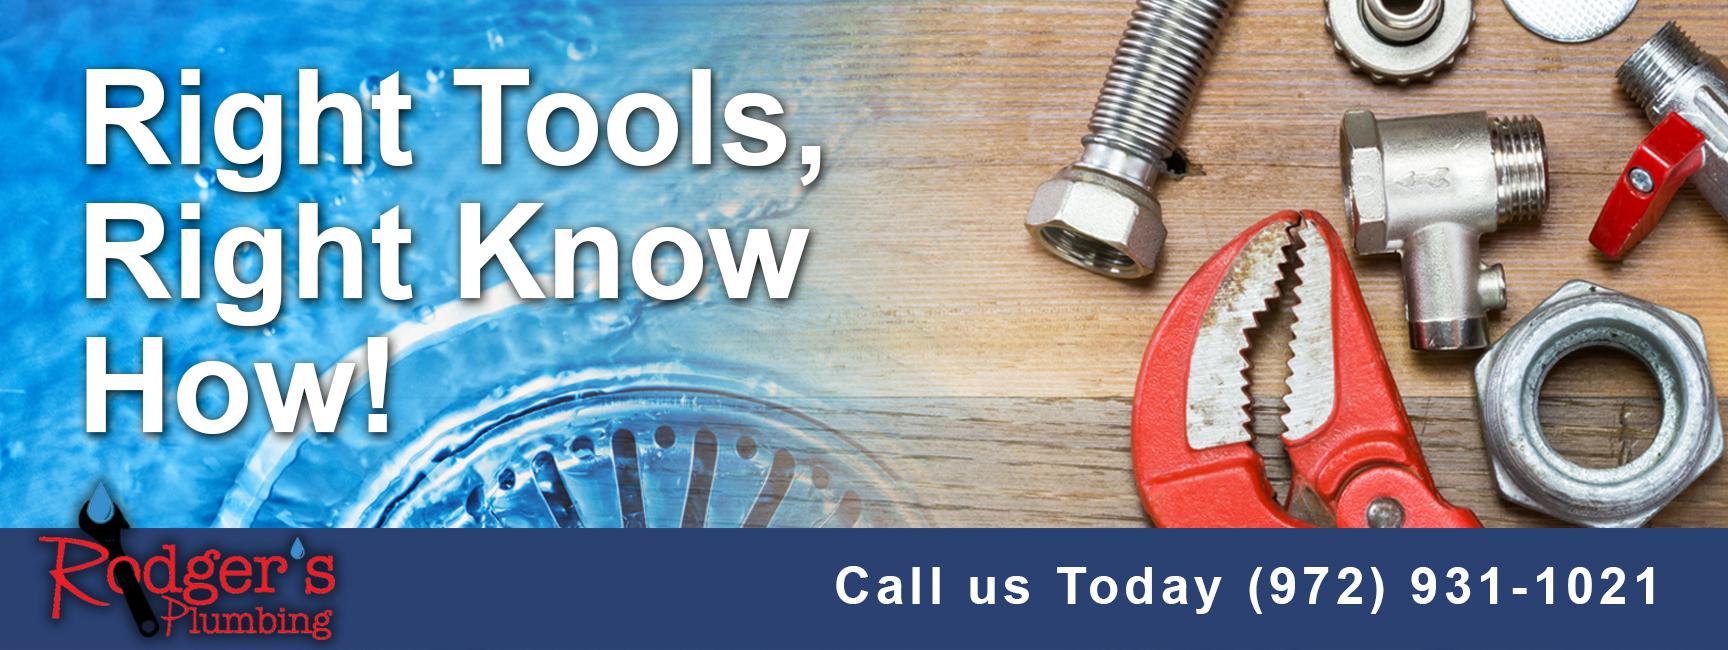 Tools-1064x400px